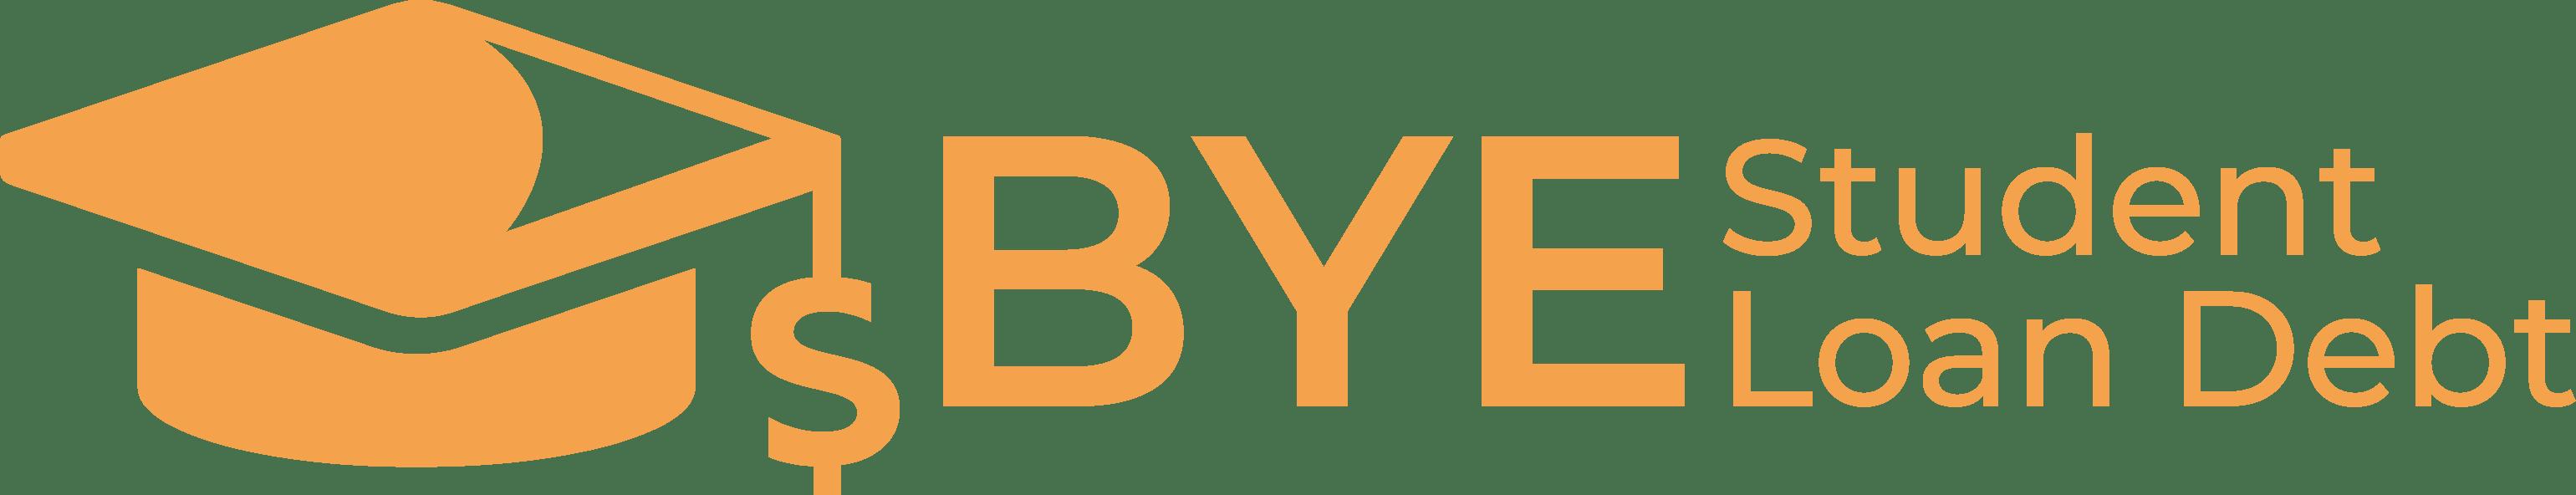 BYE Student Loan Debt: 5-step Method to Get Rid of Student Loans